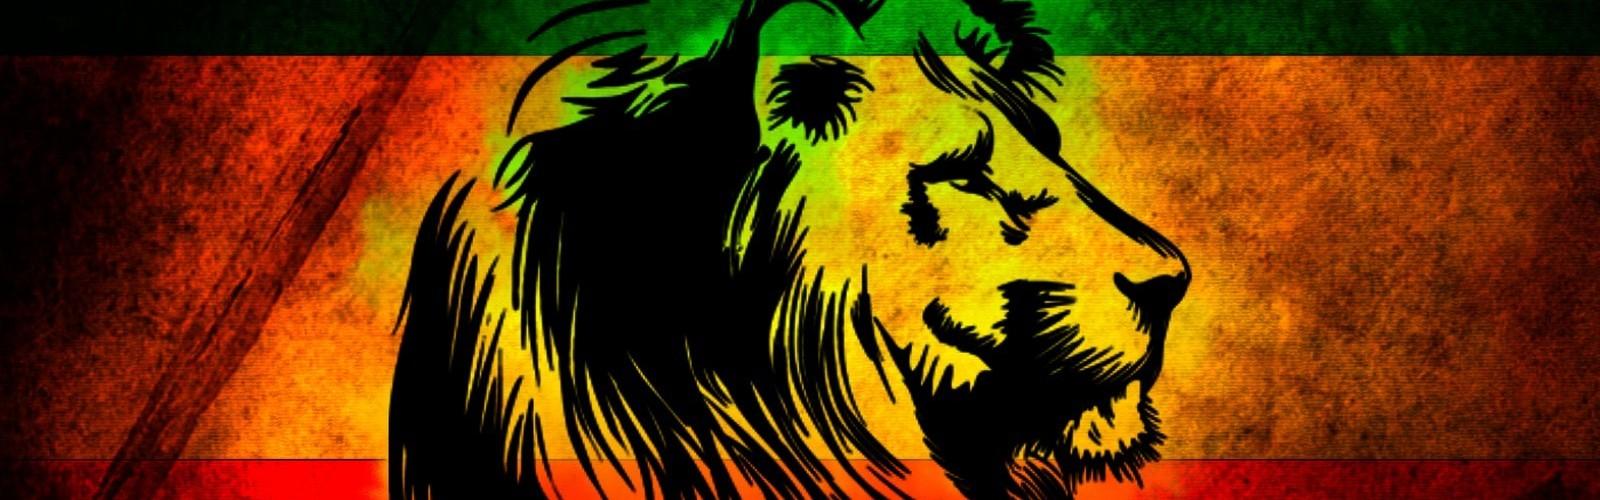 The Jamaican Vintage Area puntata 02.05 22 novembre 2015